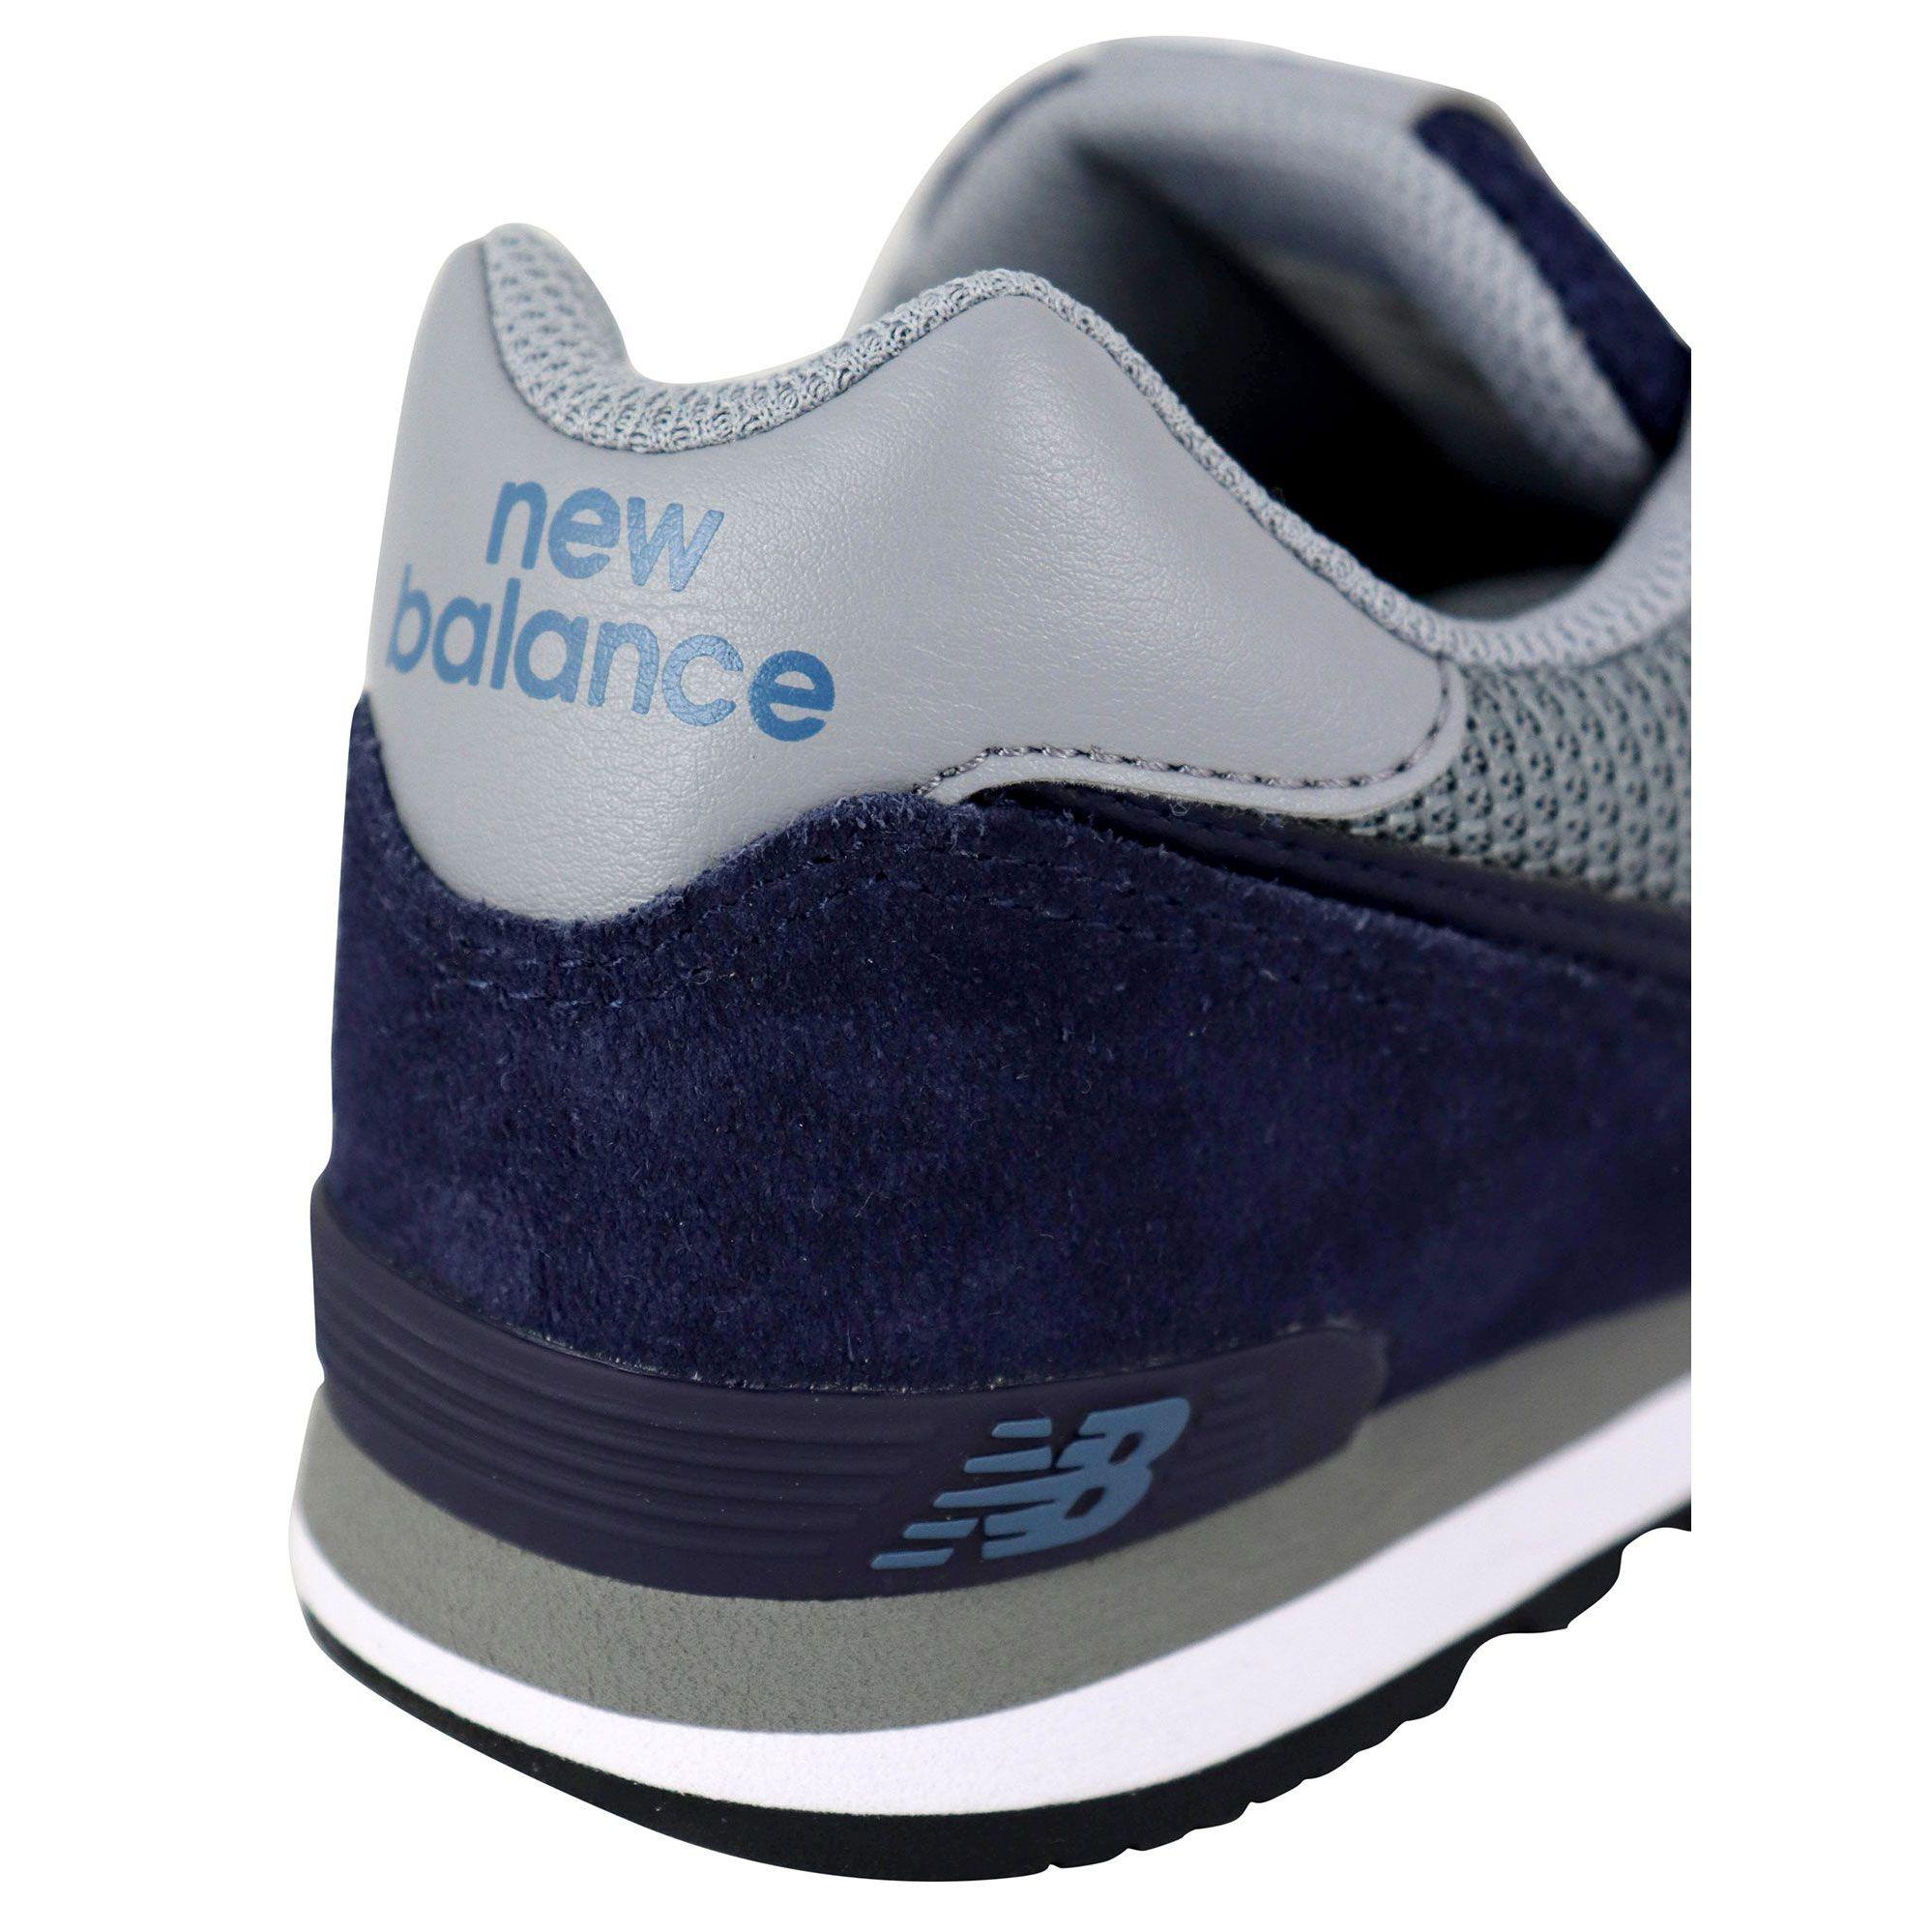 new balance ragazzo 39